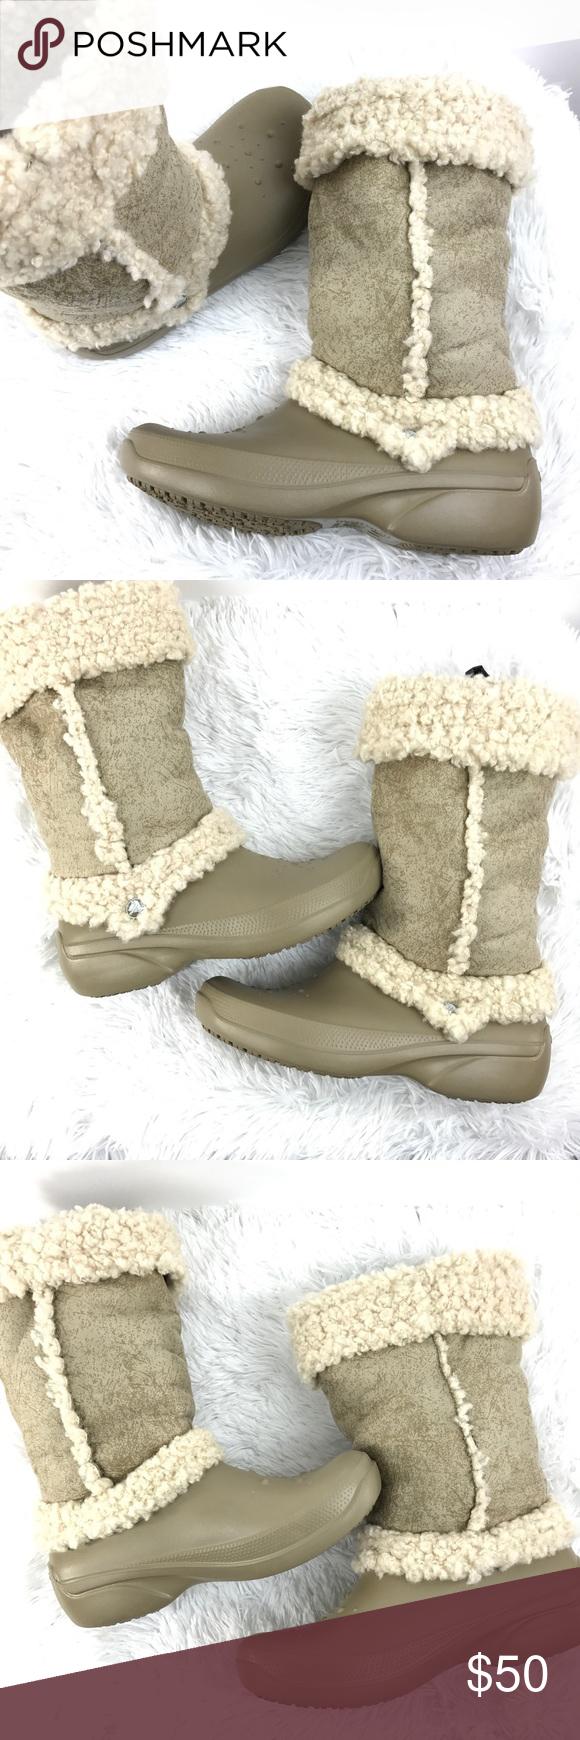 659e5fbc25a224 Crocs NADIA Khaki Winter Boots Sz 9 Faux Fur Crocs NADIA Khaki Tan Mid Calf  Winter